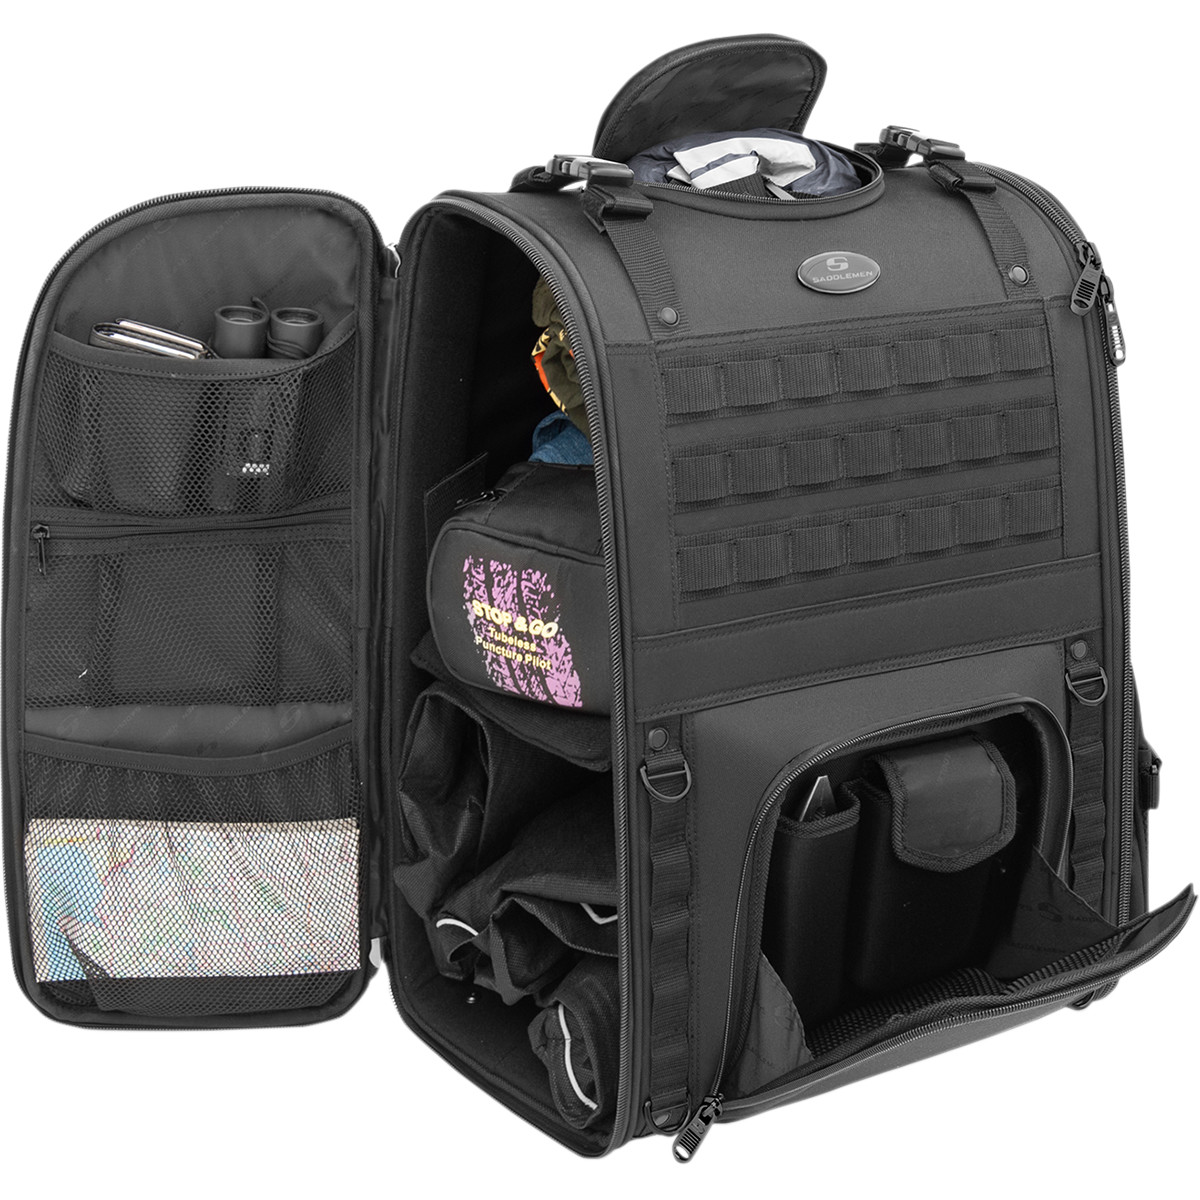 Saddlemen 'Tactical' Sissybar bag – HADELAND MULTISERVICE